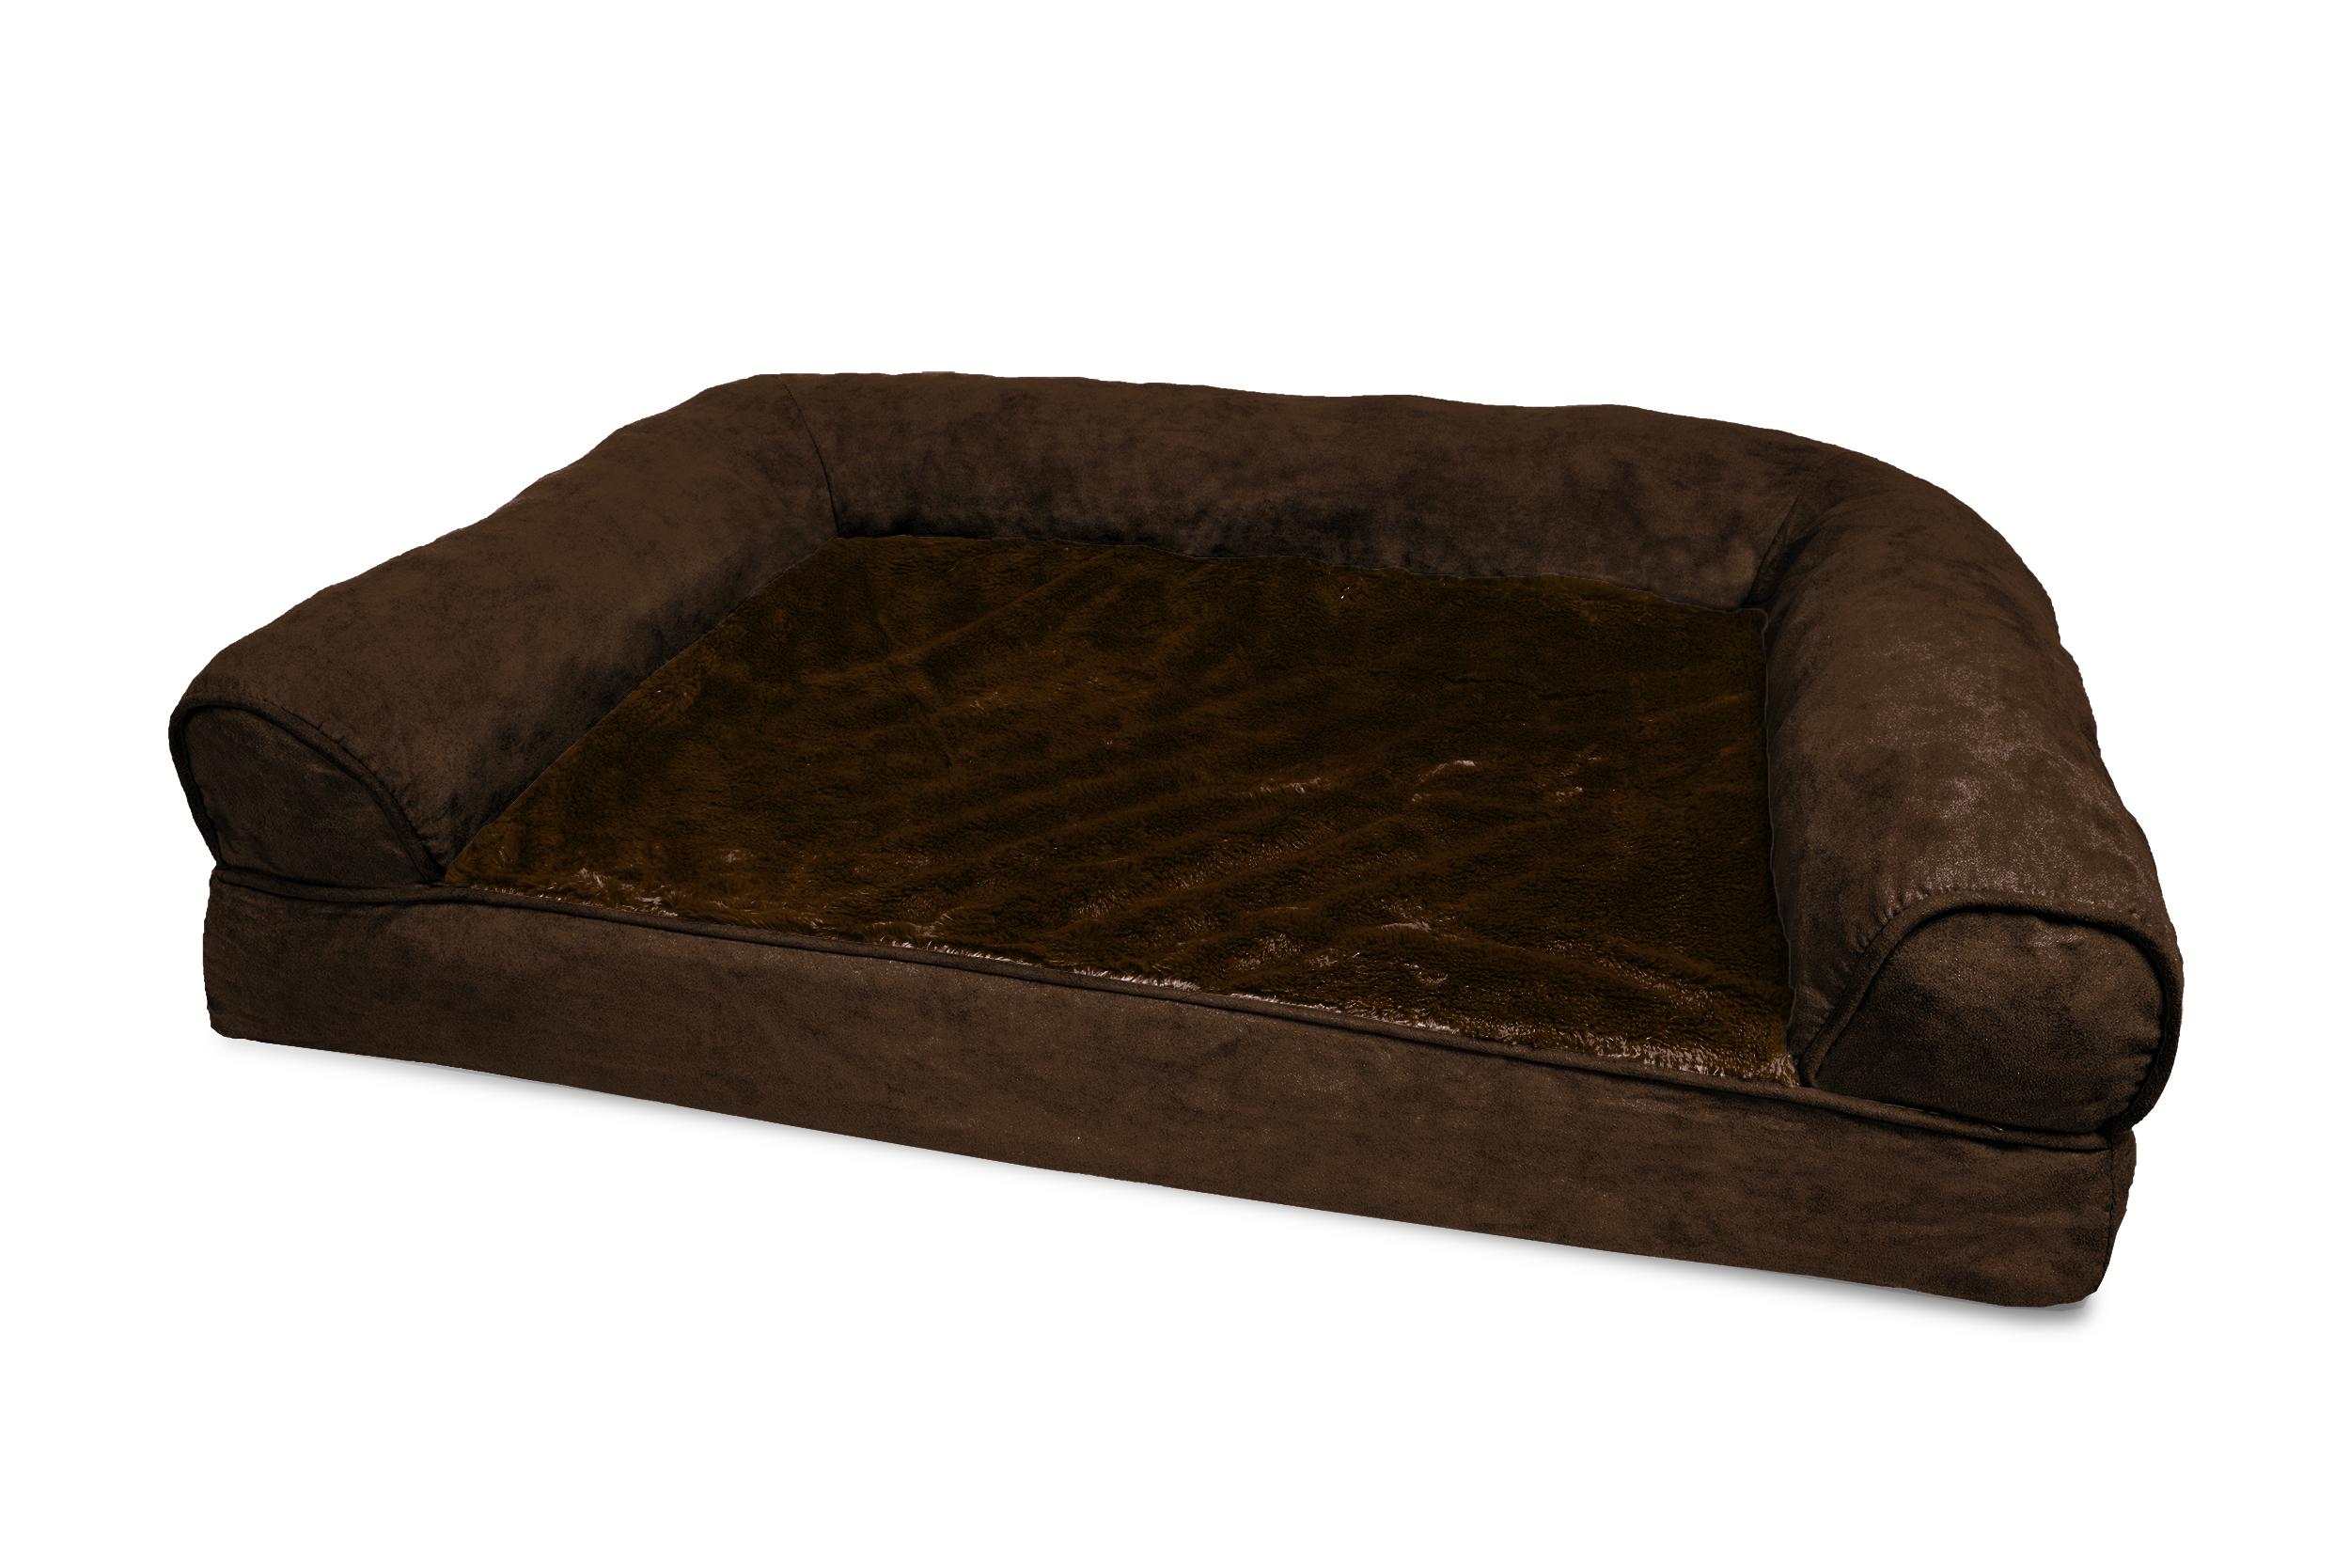 FurHaven Plush Suede Orthopedic Sofa Dog Bed Pet Bed eBay